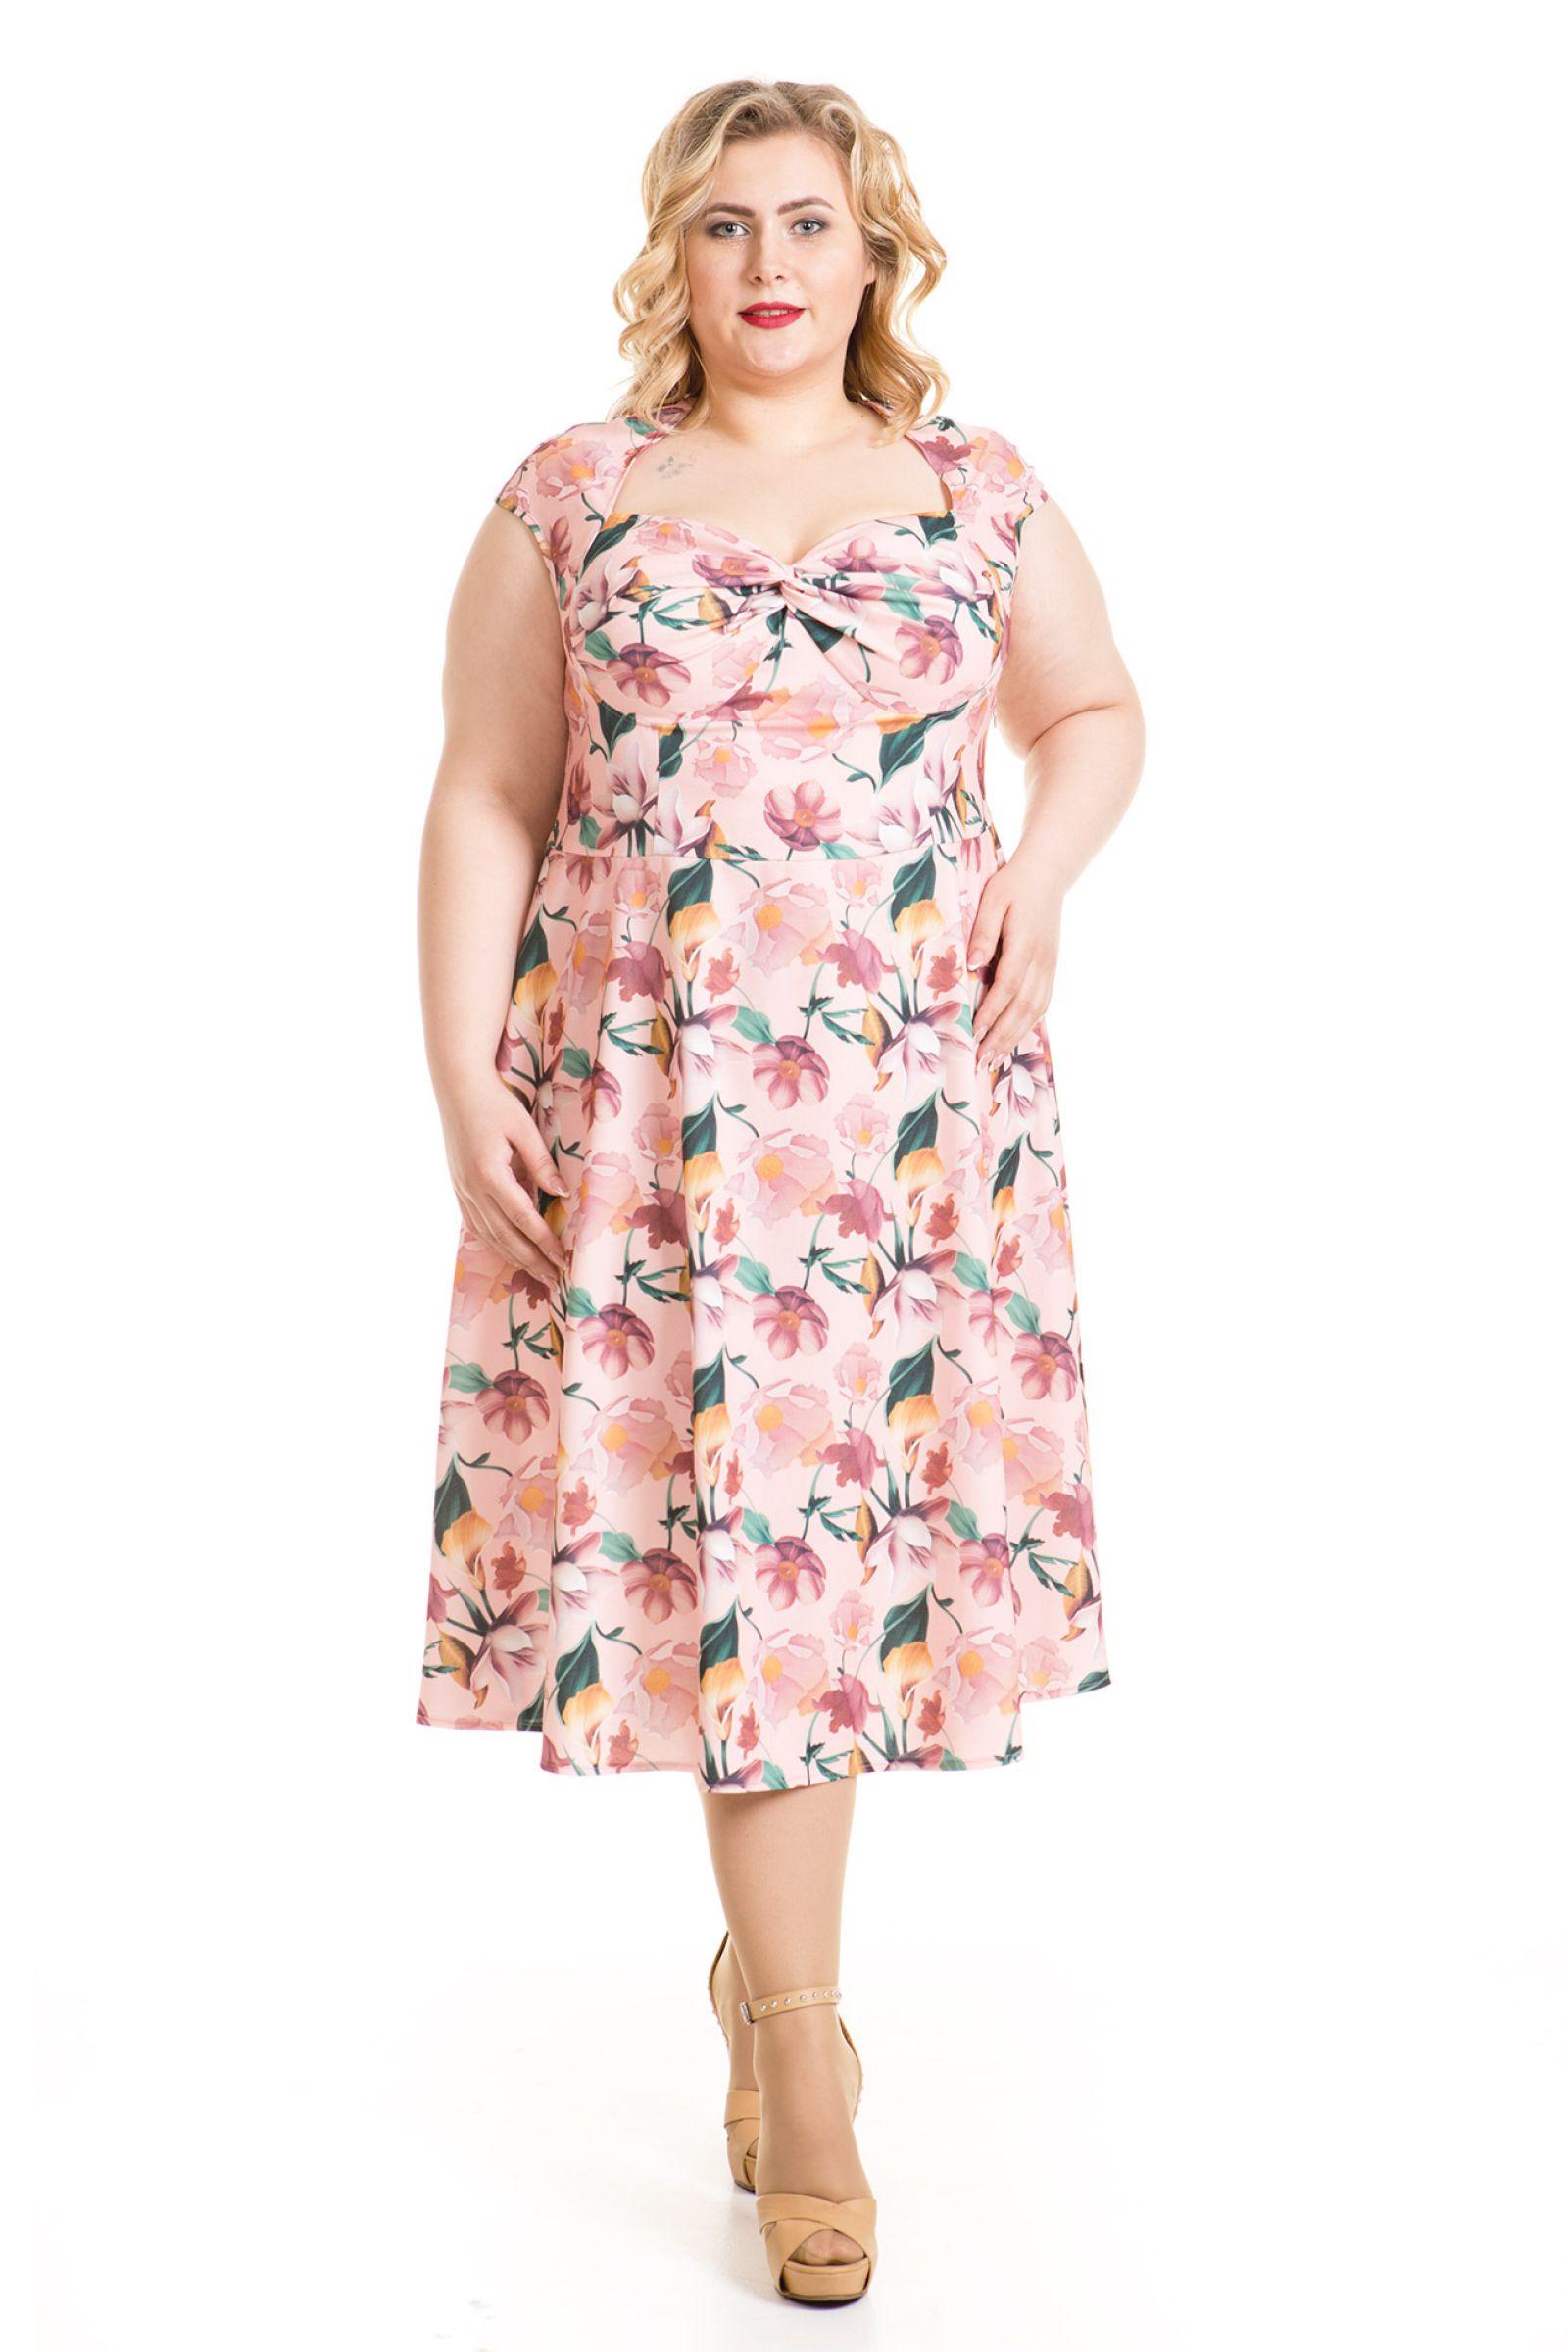 a18a2073014 нарядное летнее платье для полных